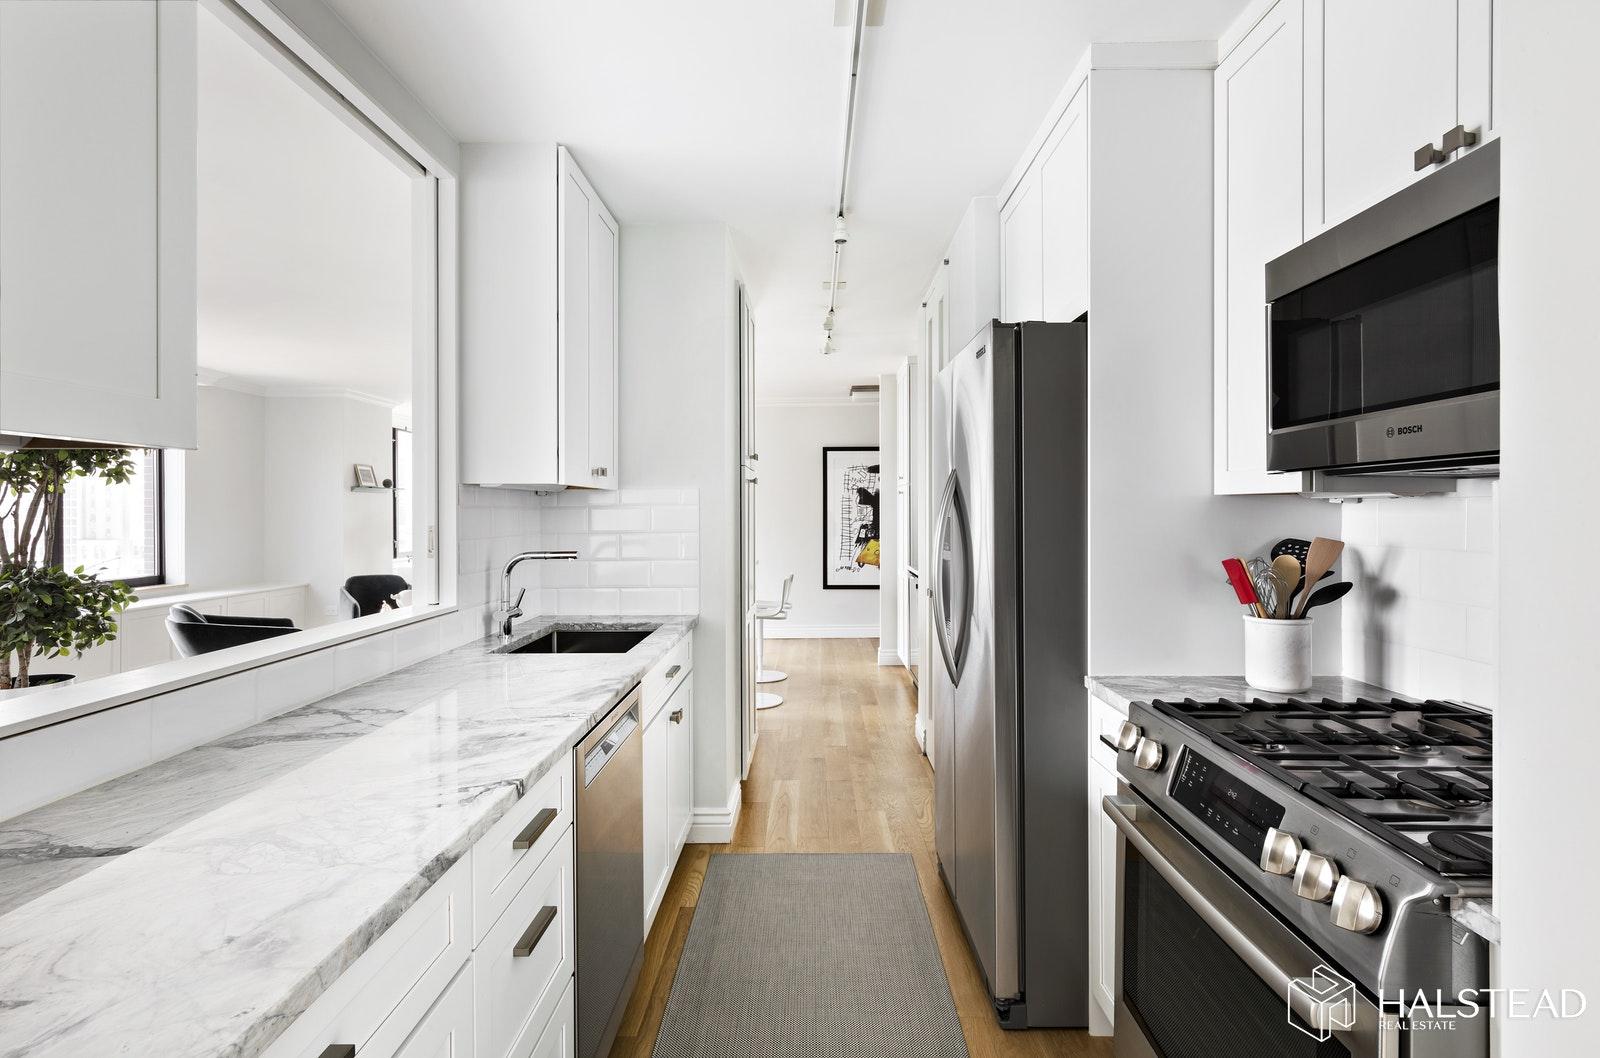 422 EAST 72ND STREET 30BC, Upper East Side, $3,495,000, Web #: 19785536